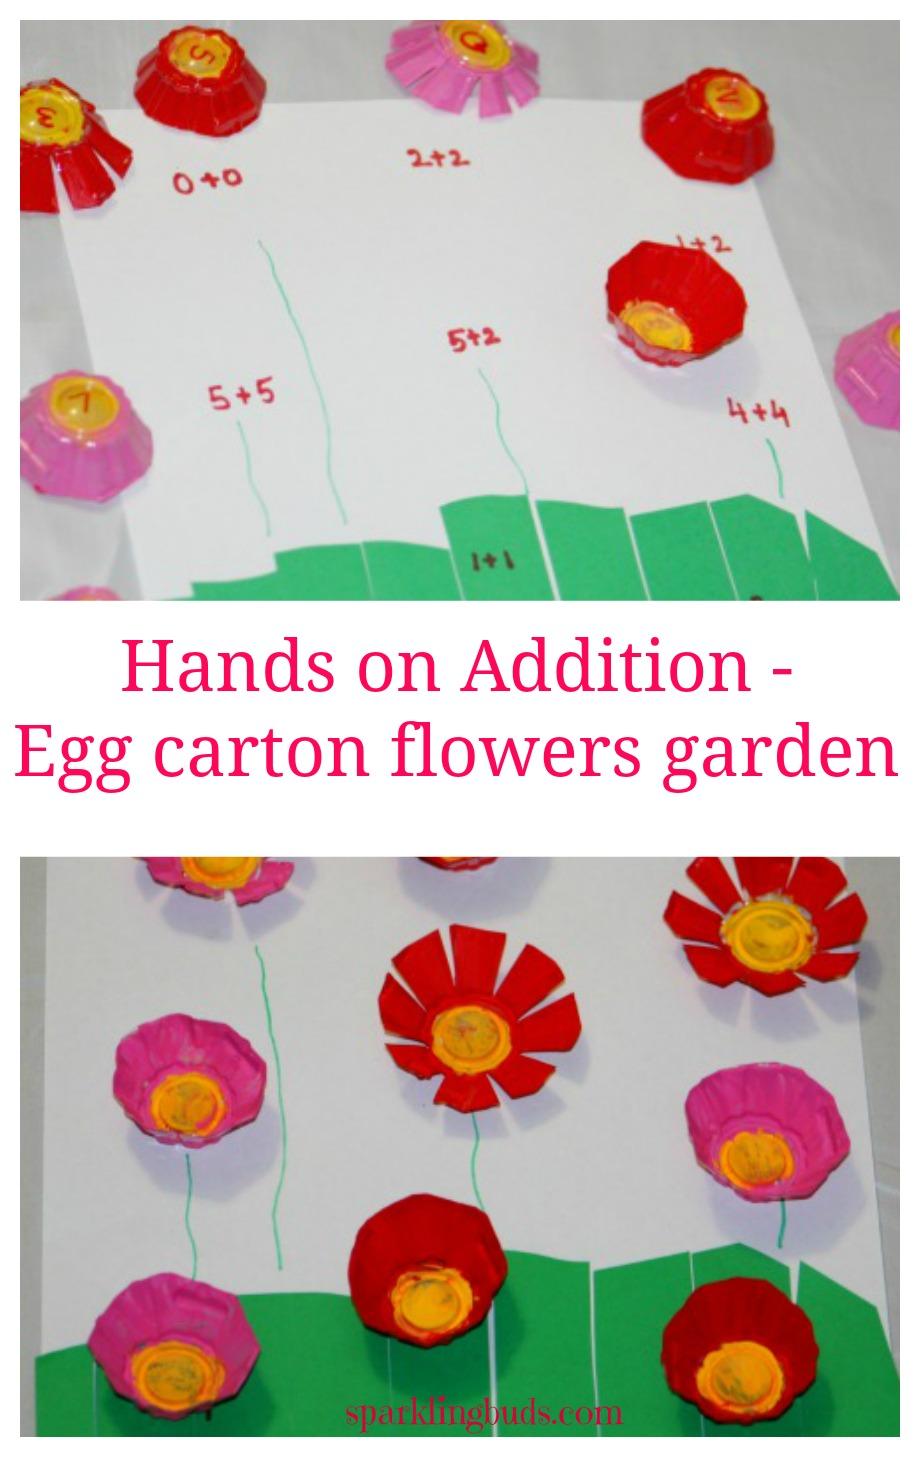 Hands on math games for preschoolers